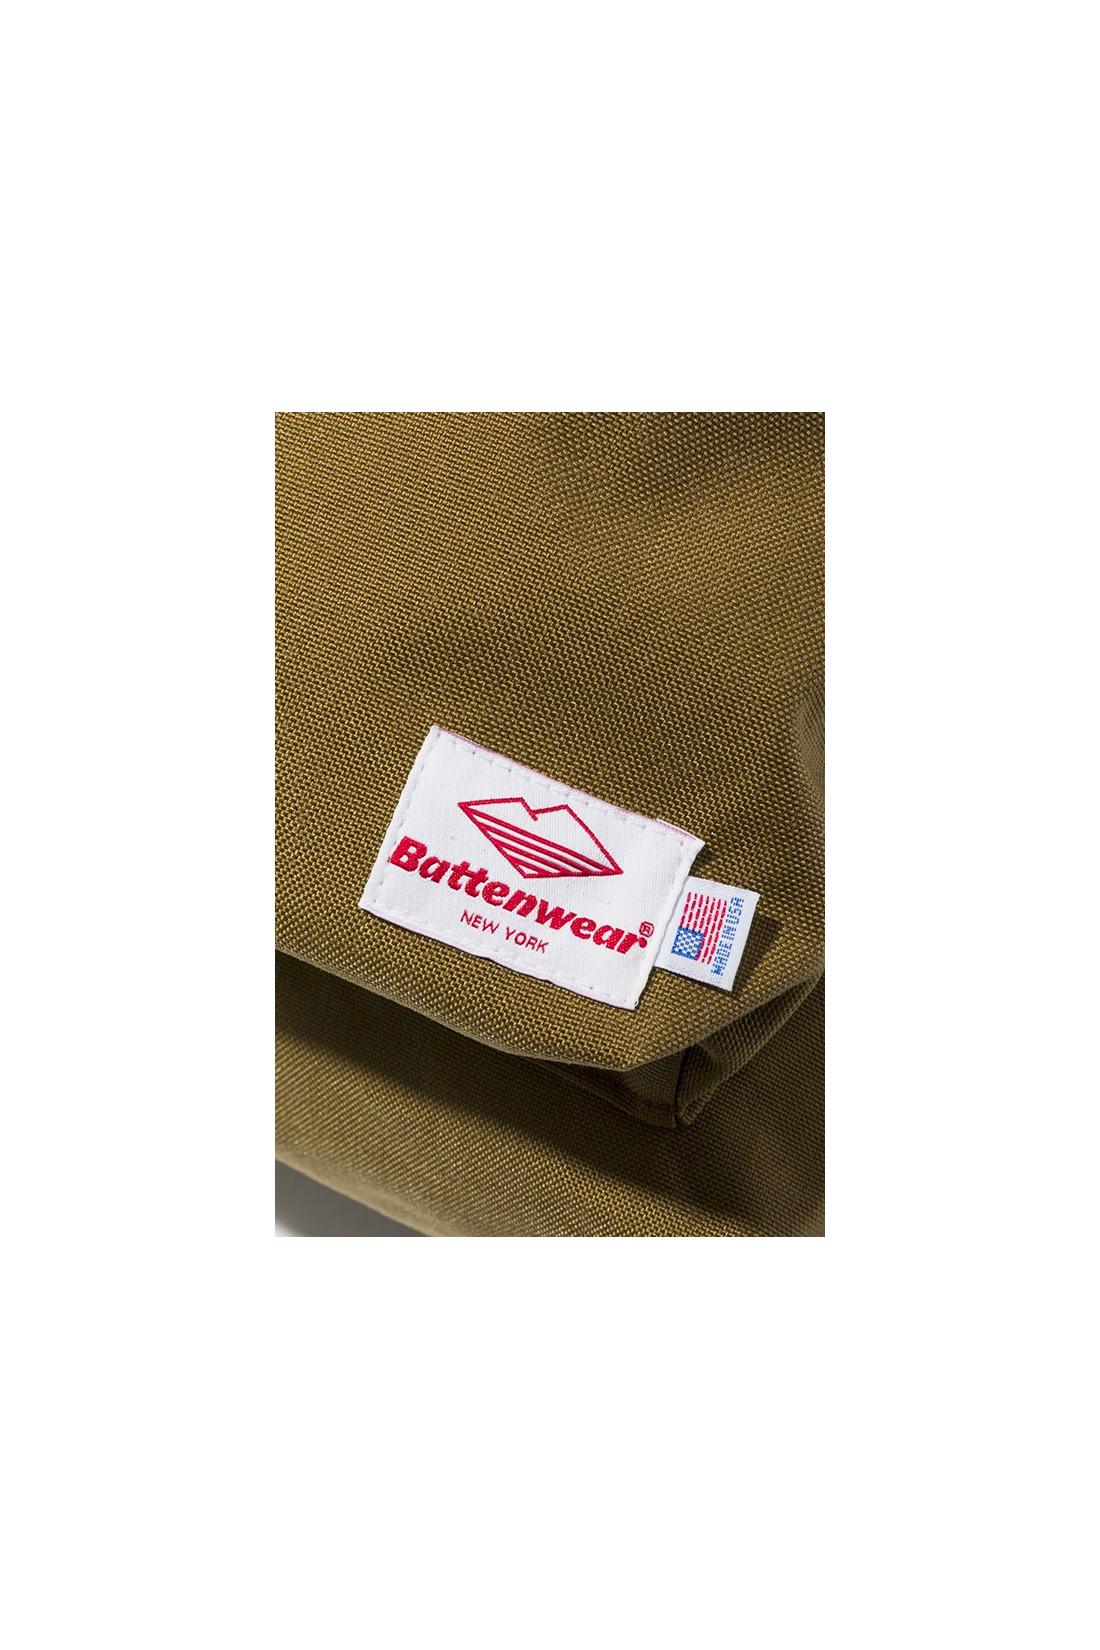 BATTENWEAR / Day hiker Coyote nylon